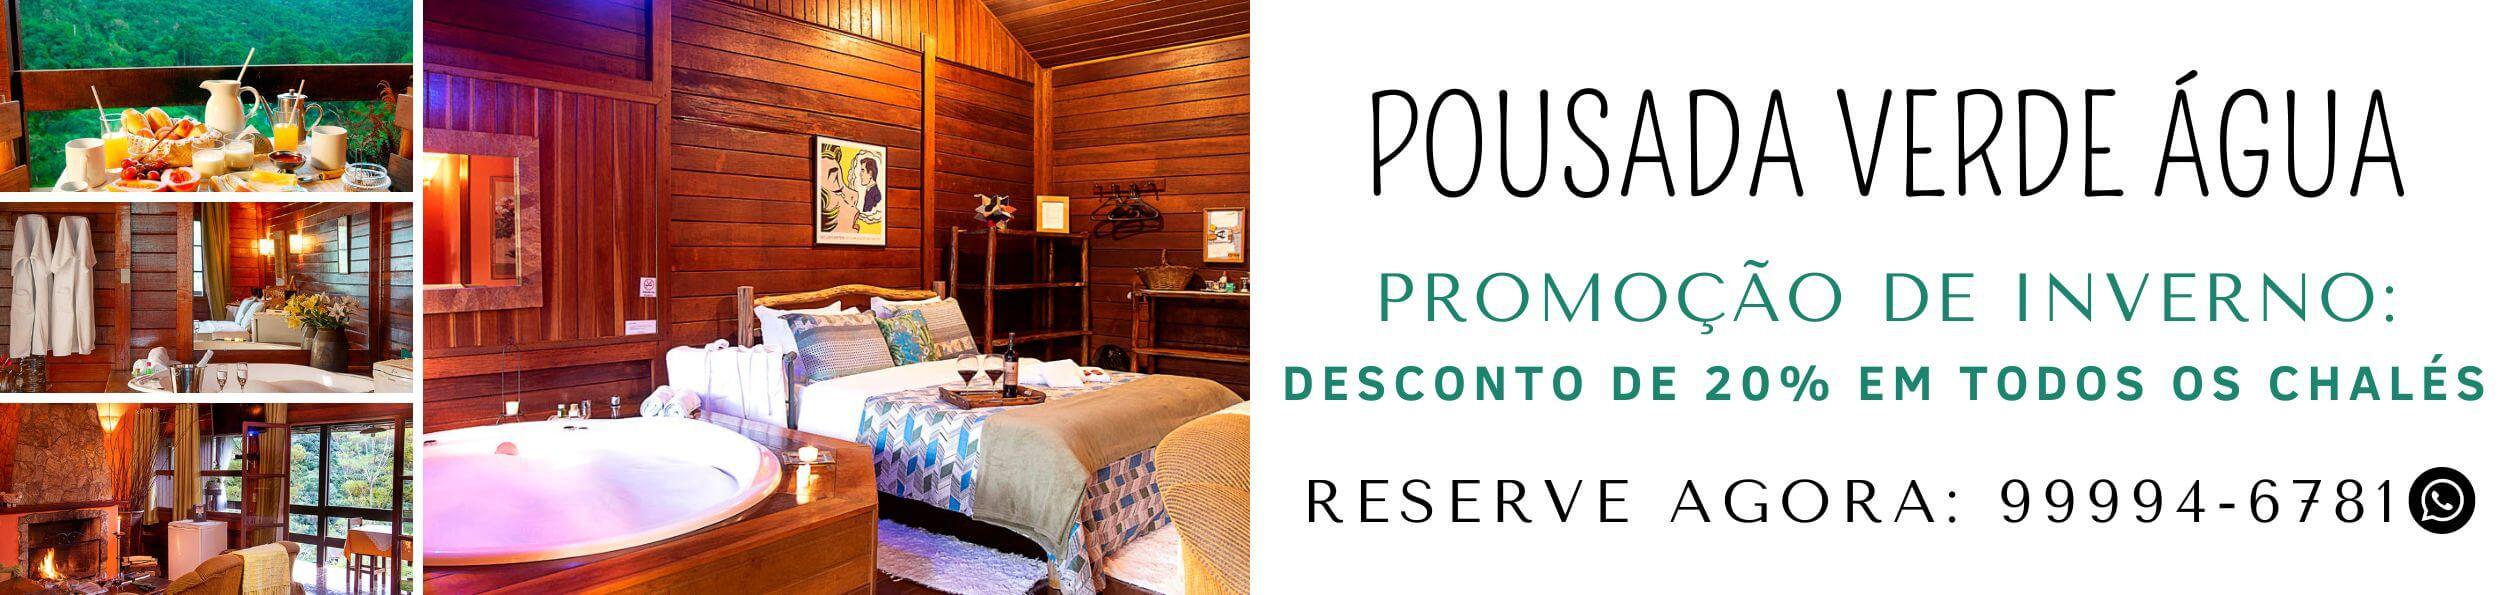 Portal Visconde de Mauá - Central de Reservas